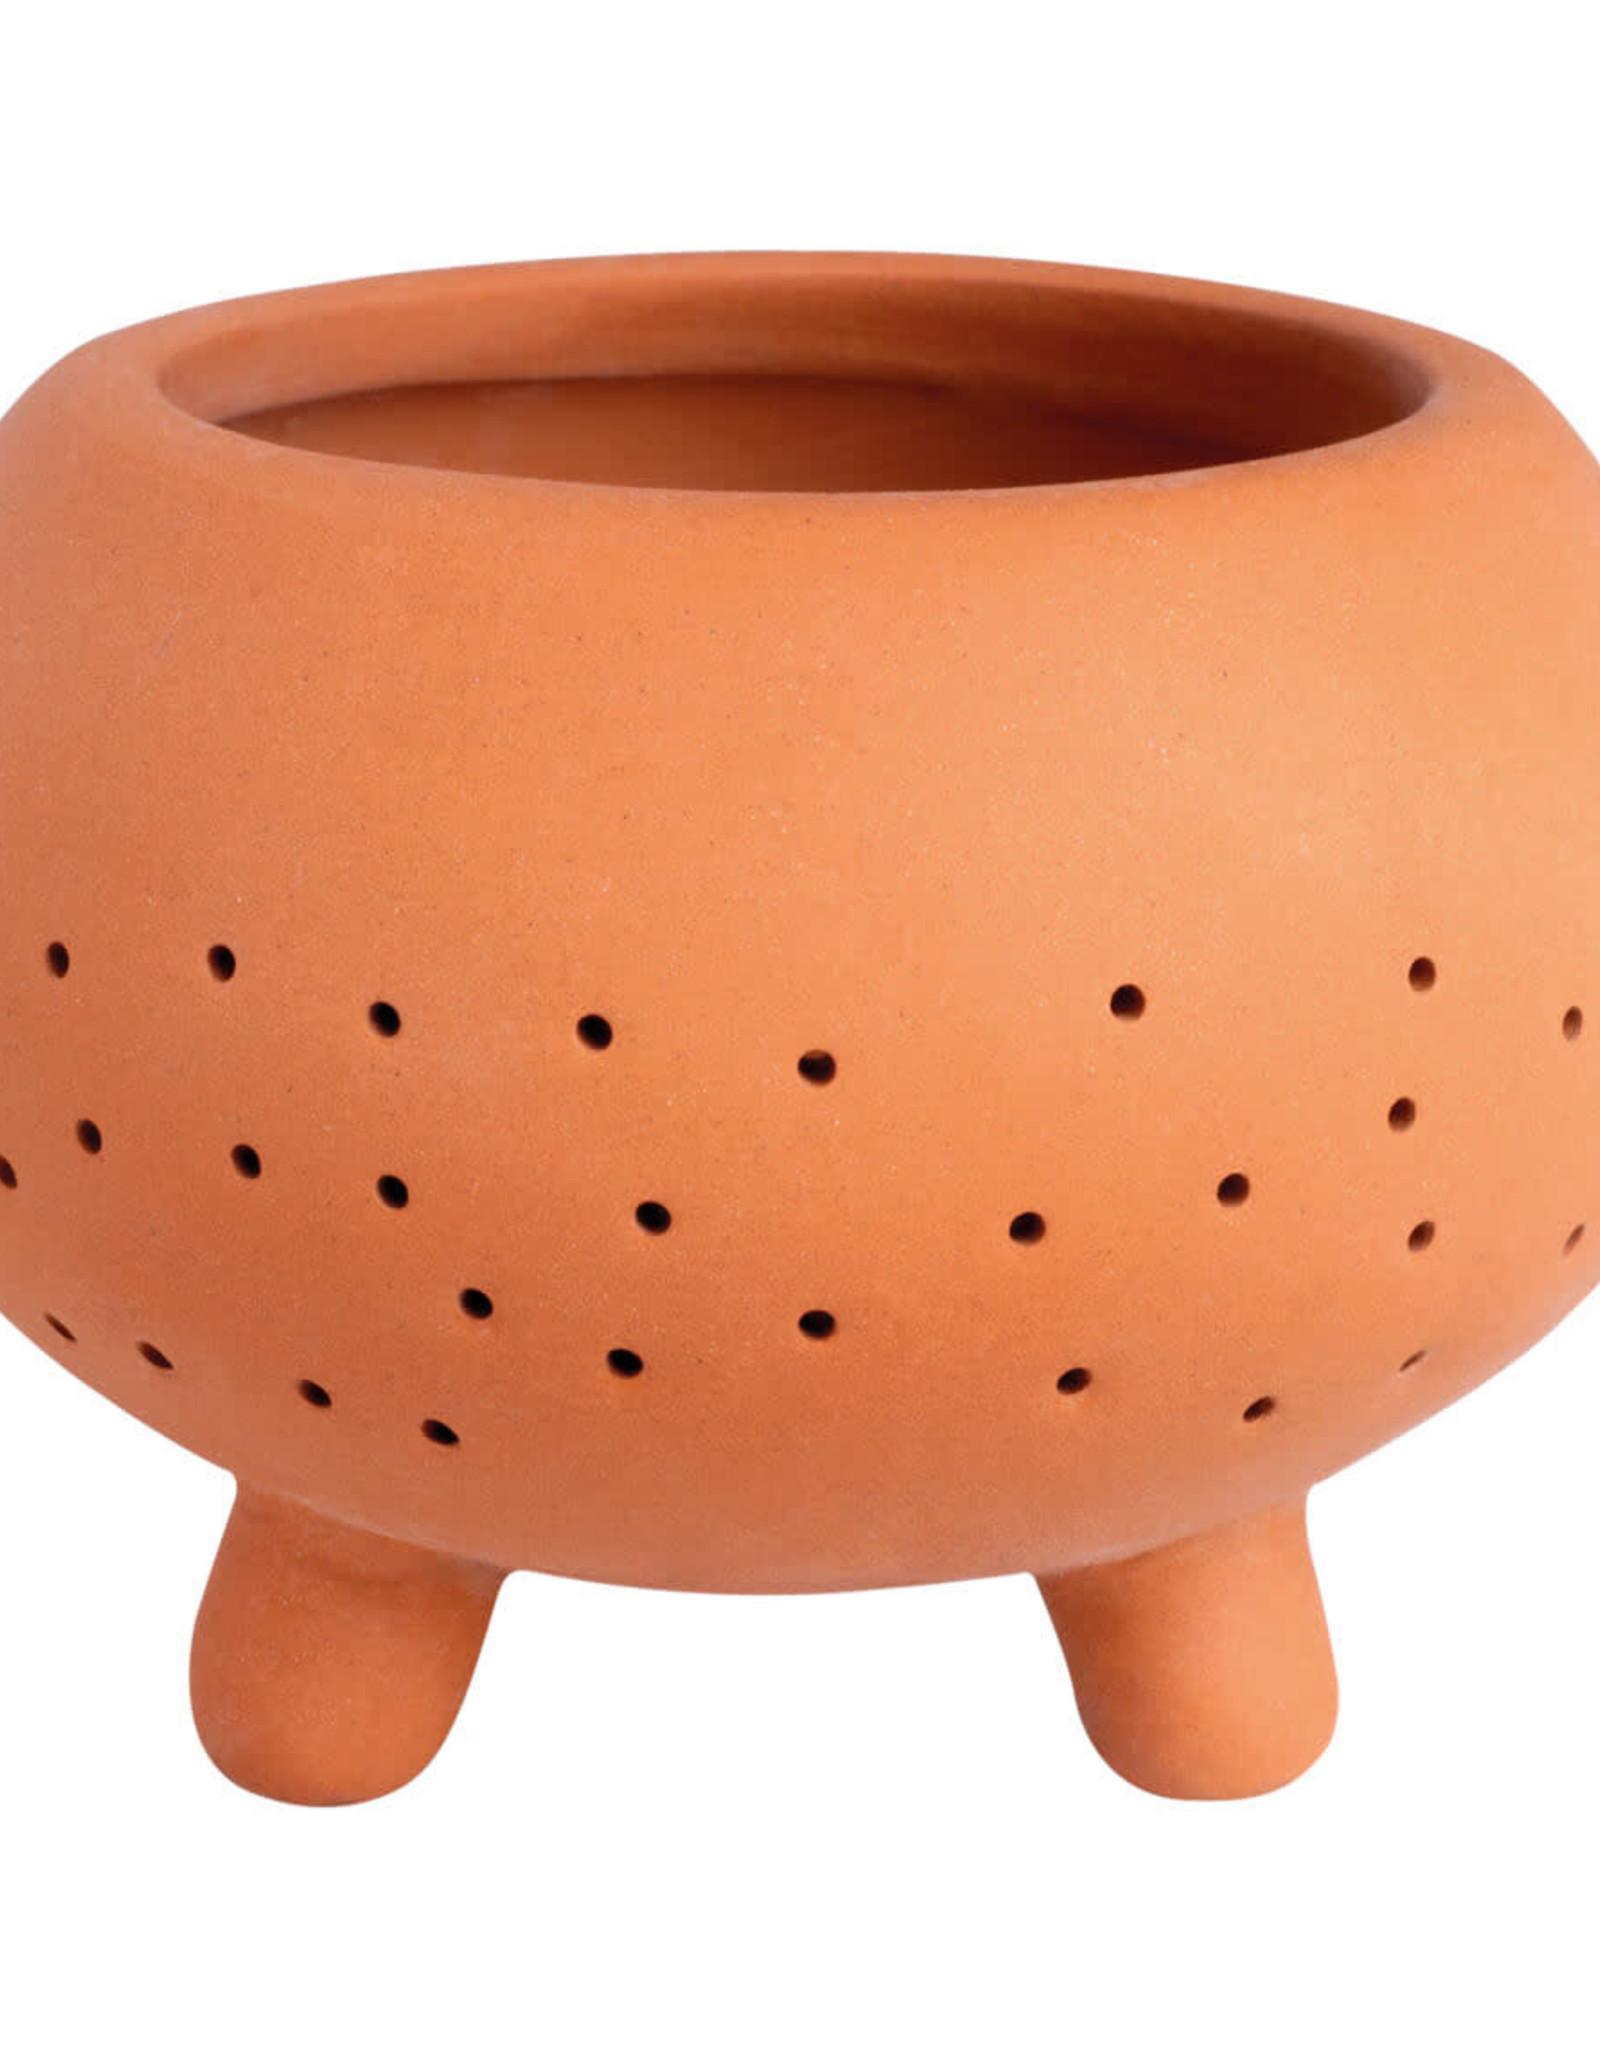 Räder Räder - Outdoor terracotta tealight - large